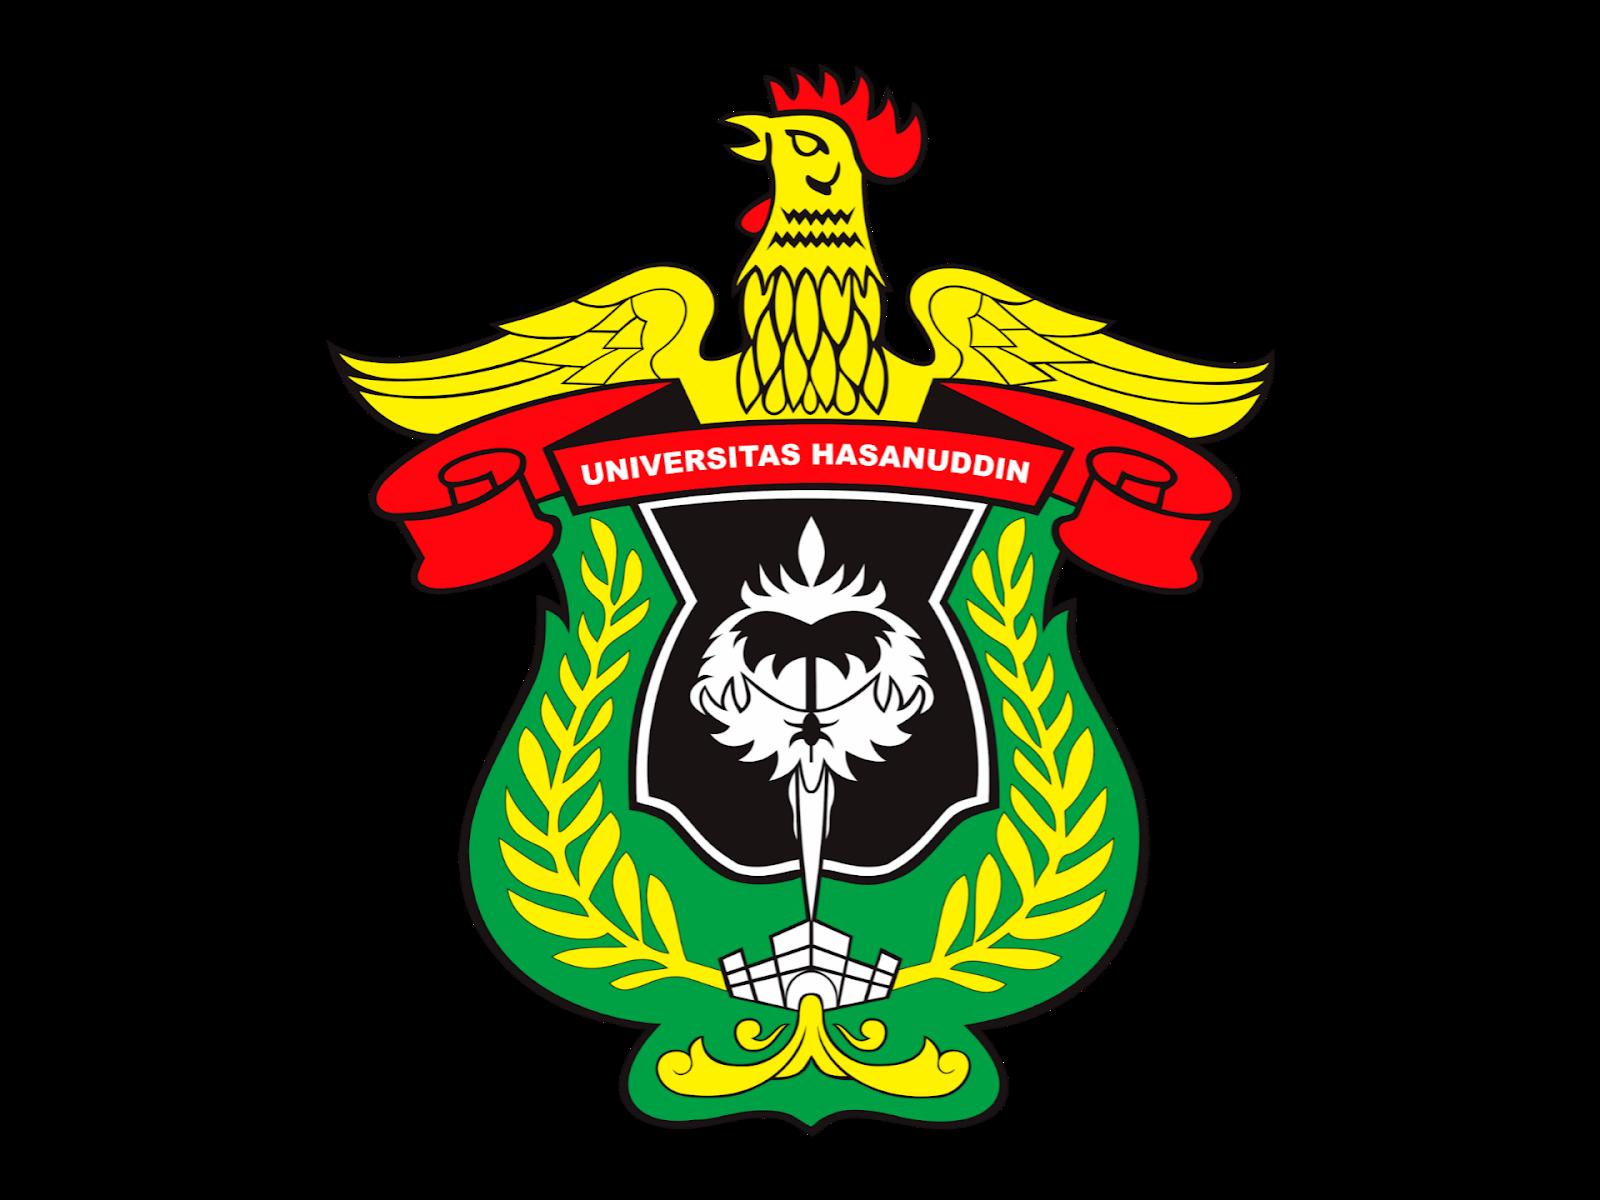 Logo UNHAS (Universitas Hasanuddin) Format PNG